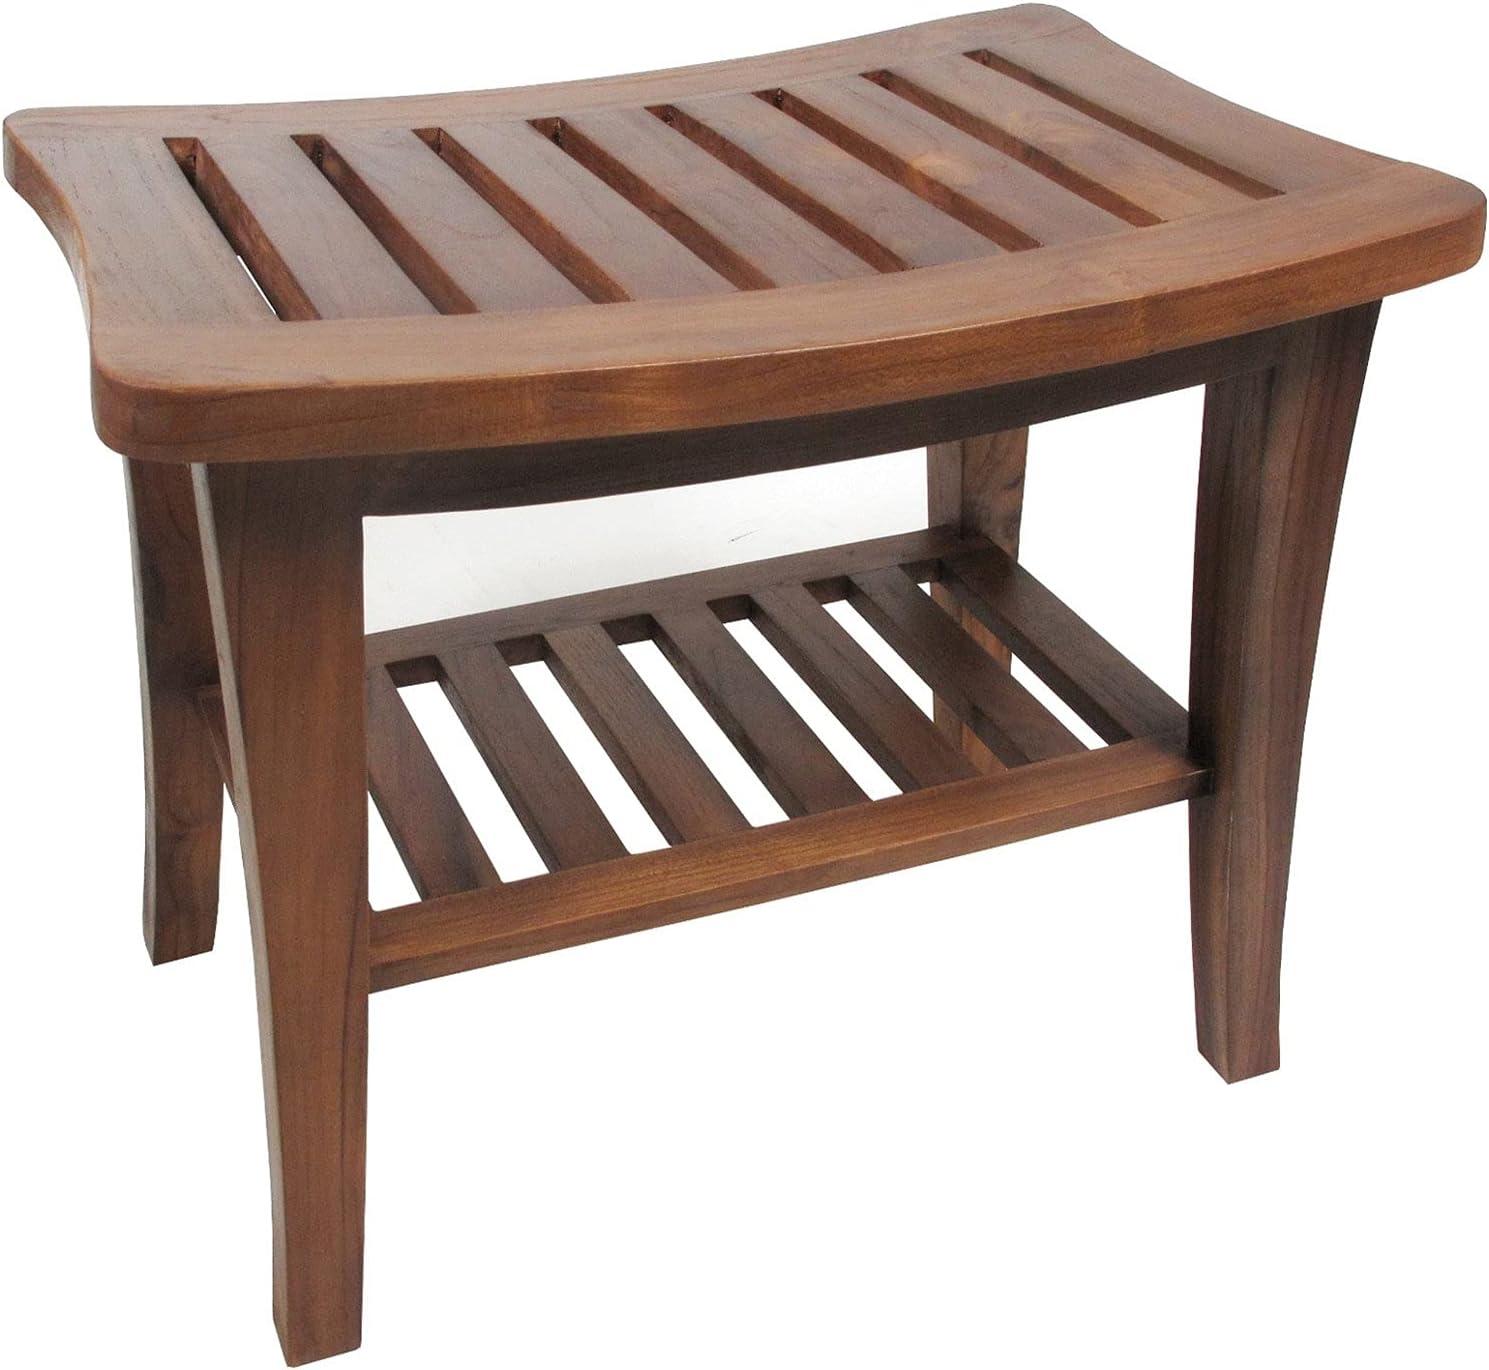 Ala Teak Indoor Outdoor Patio Garden Yard Bath Shower Spa Waterproof Stool Bench Fully Assembled : Patio, Lawn & Garden